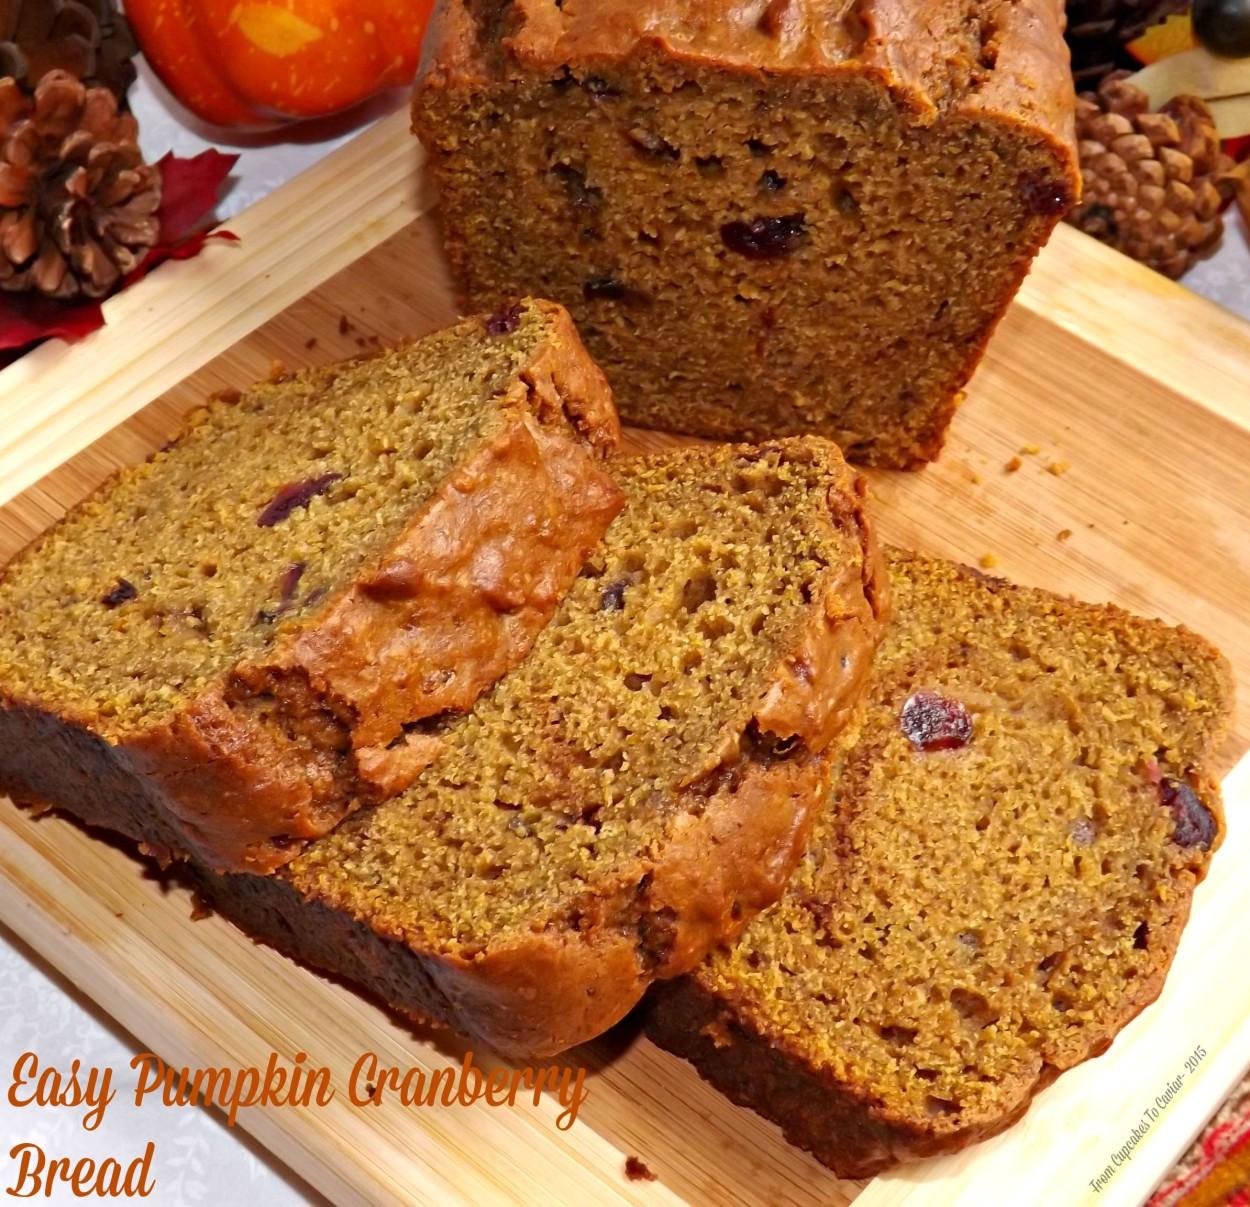 Easy Pumpkin Cranberry Bread